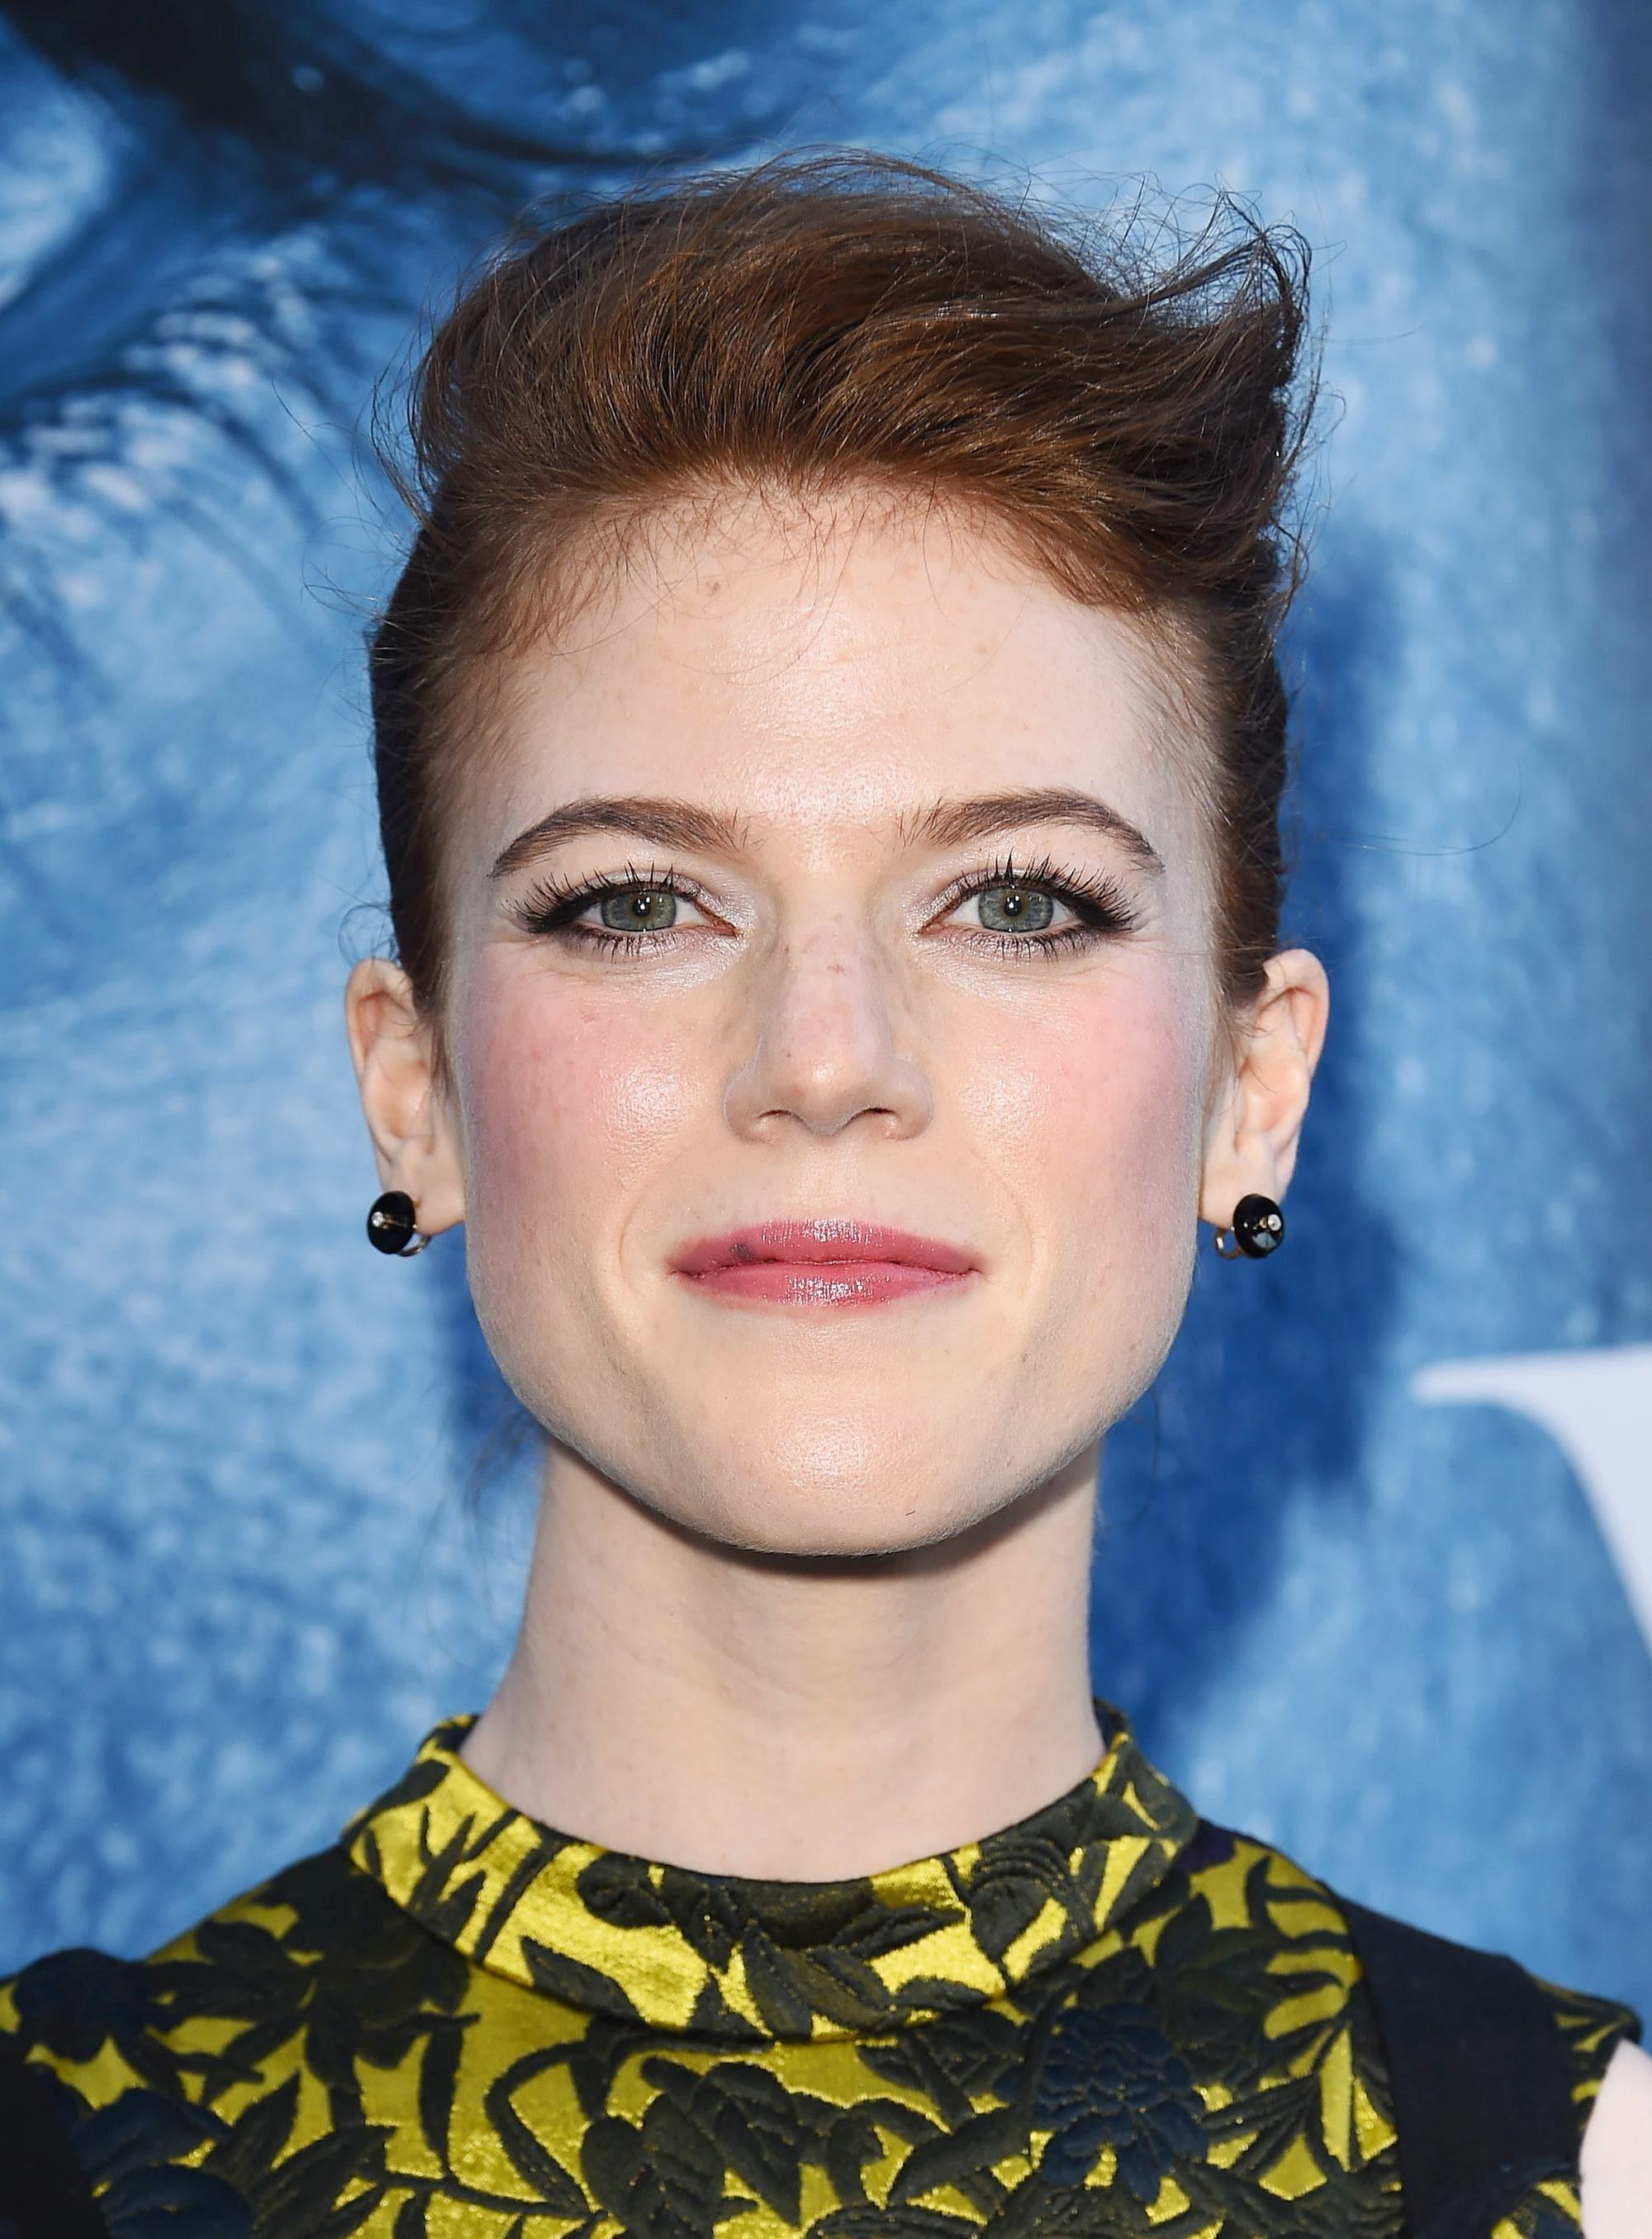 Game of Thrones season 7 premiere: The best red carpet hair looks